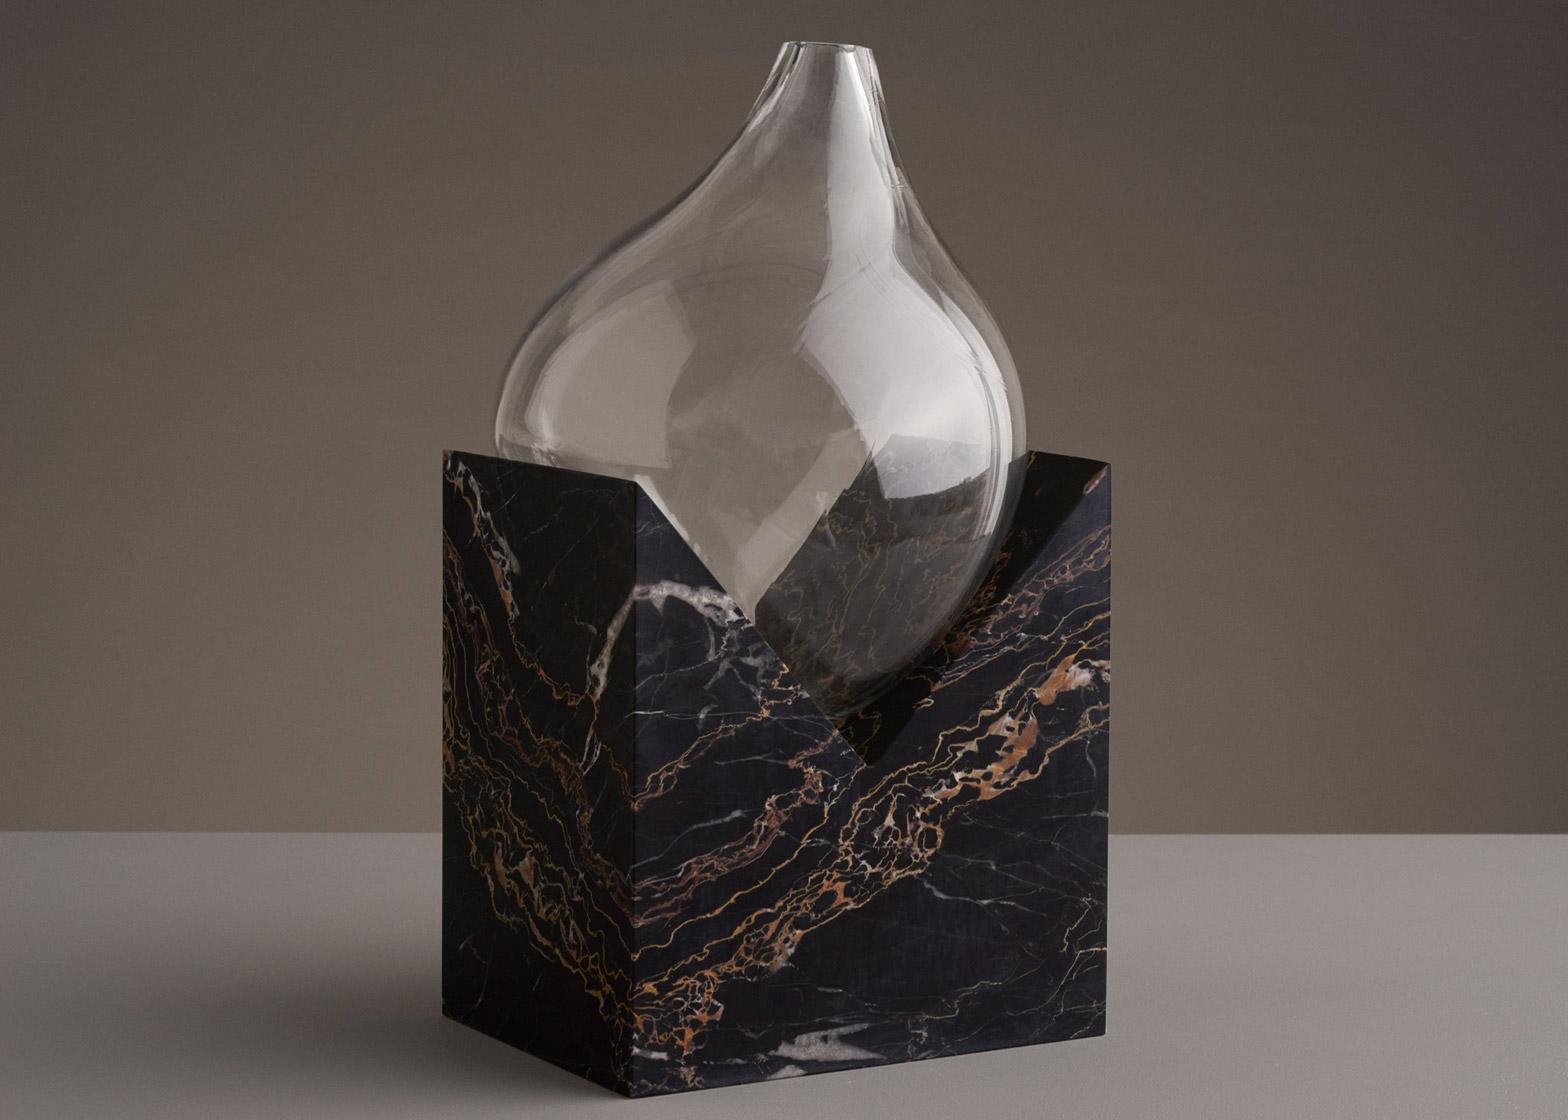 studio-eo-indefinite-vases-artist-oracle-fox-01